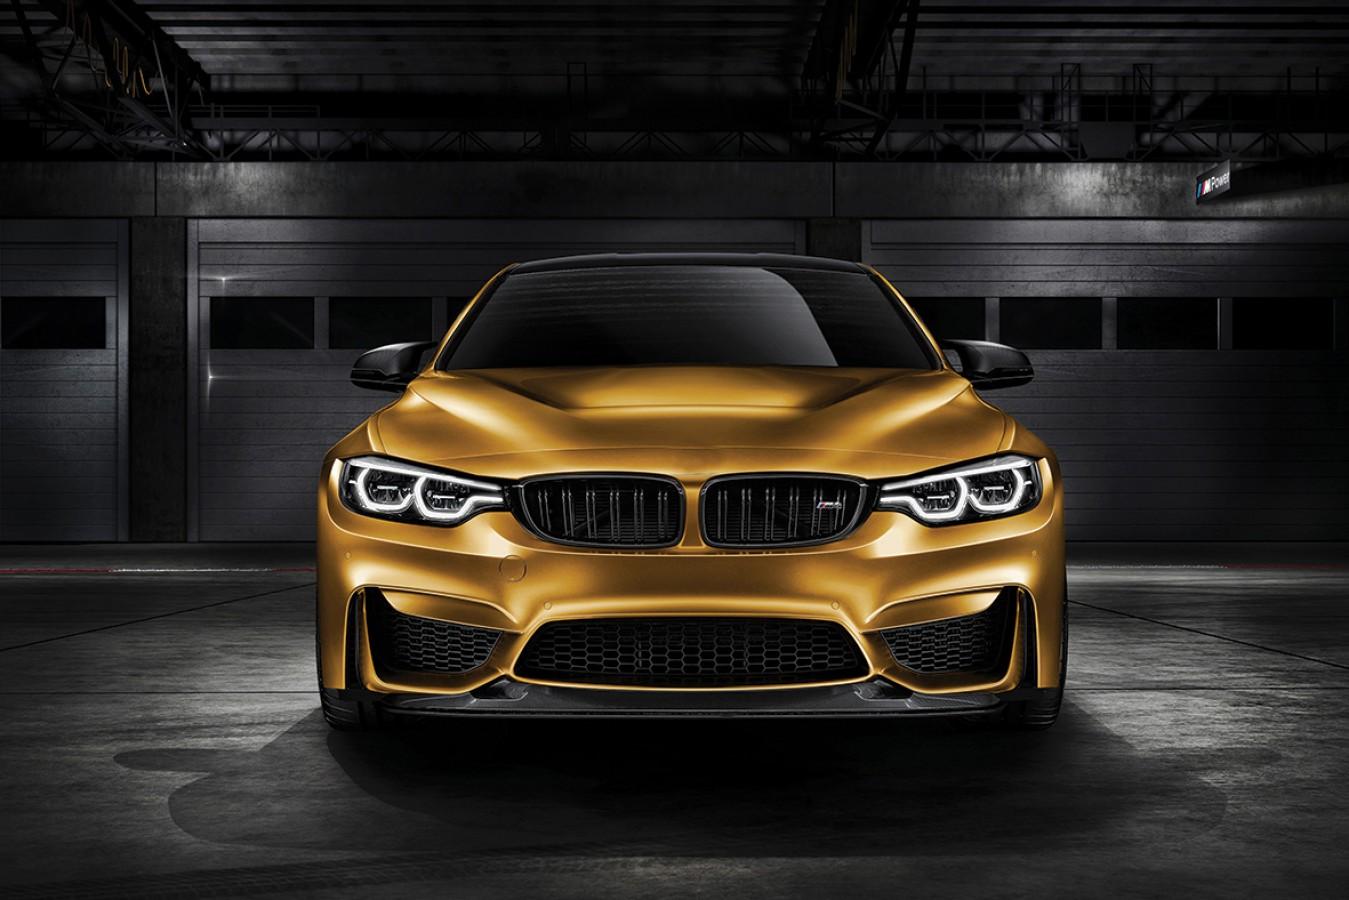 Fotomural BMW Gold A08-M931 Fotomural BMW Gold A08-M931